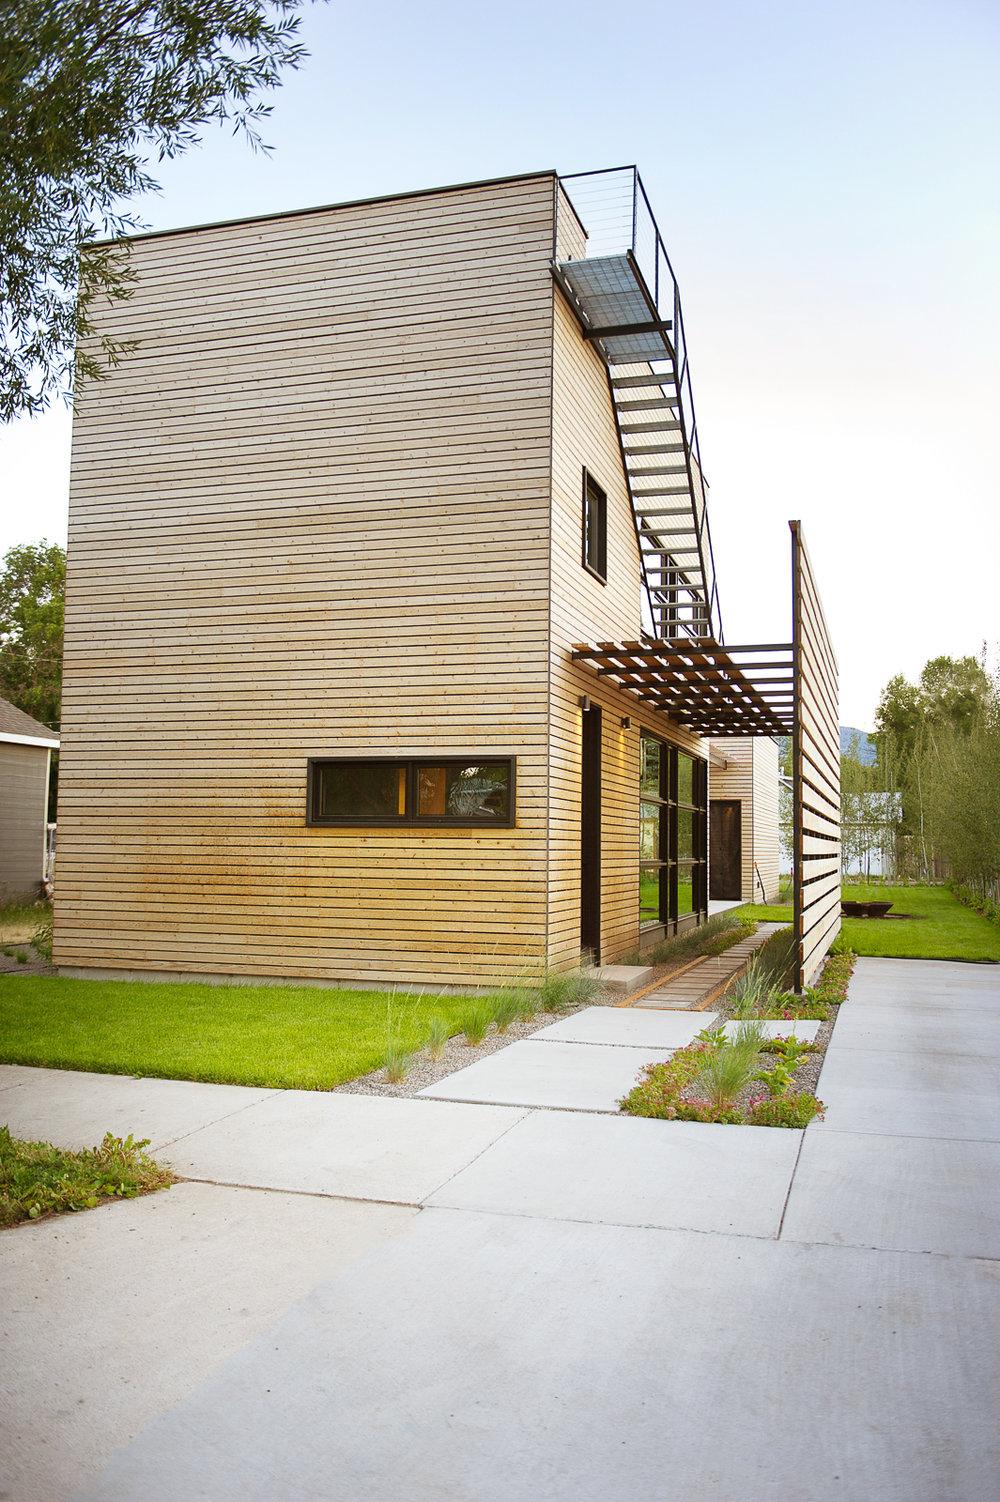 Woodworks-West-Bozeman-Montana-Builder-Cabinetry-Remodel-New-Construction-2777.jpg